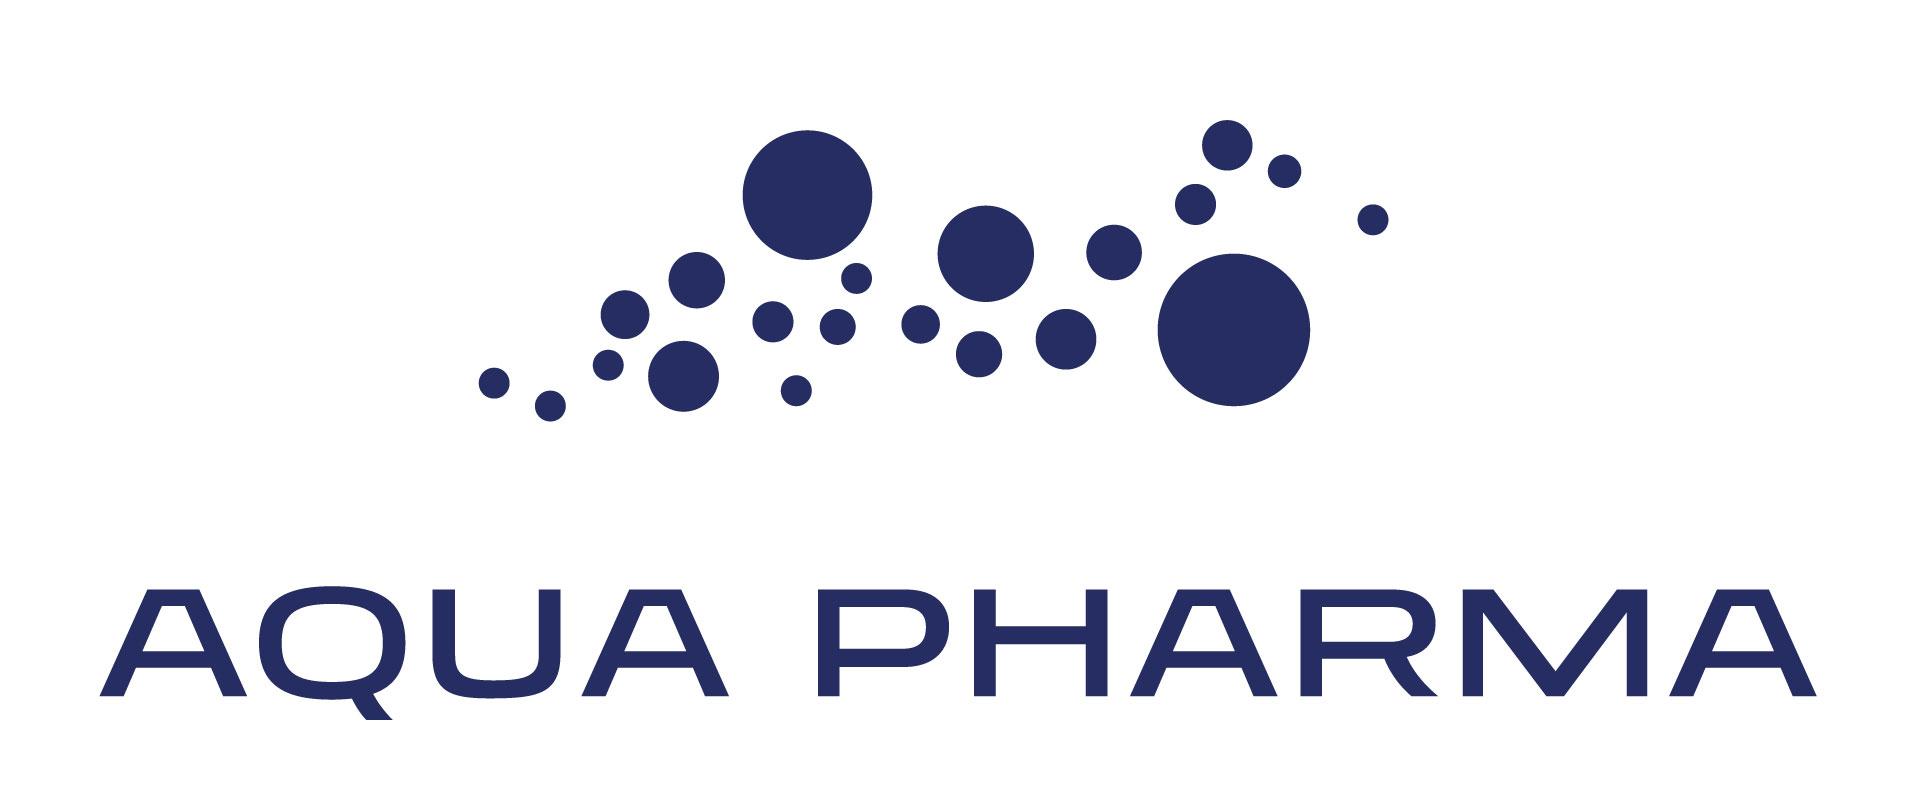 Aqua Pharma Inc.